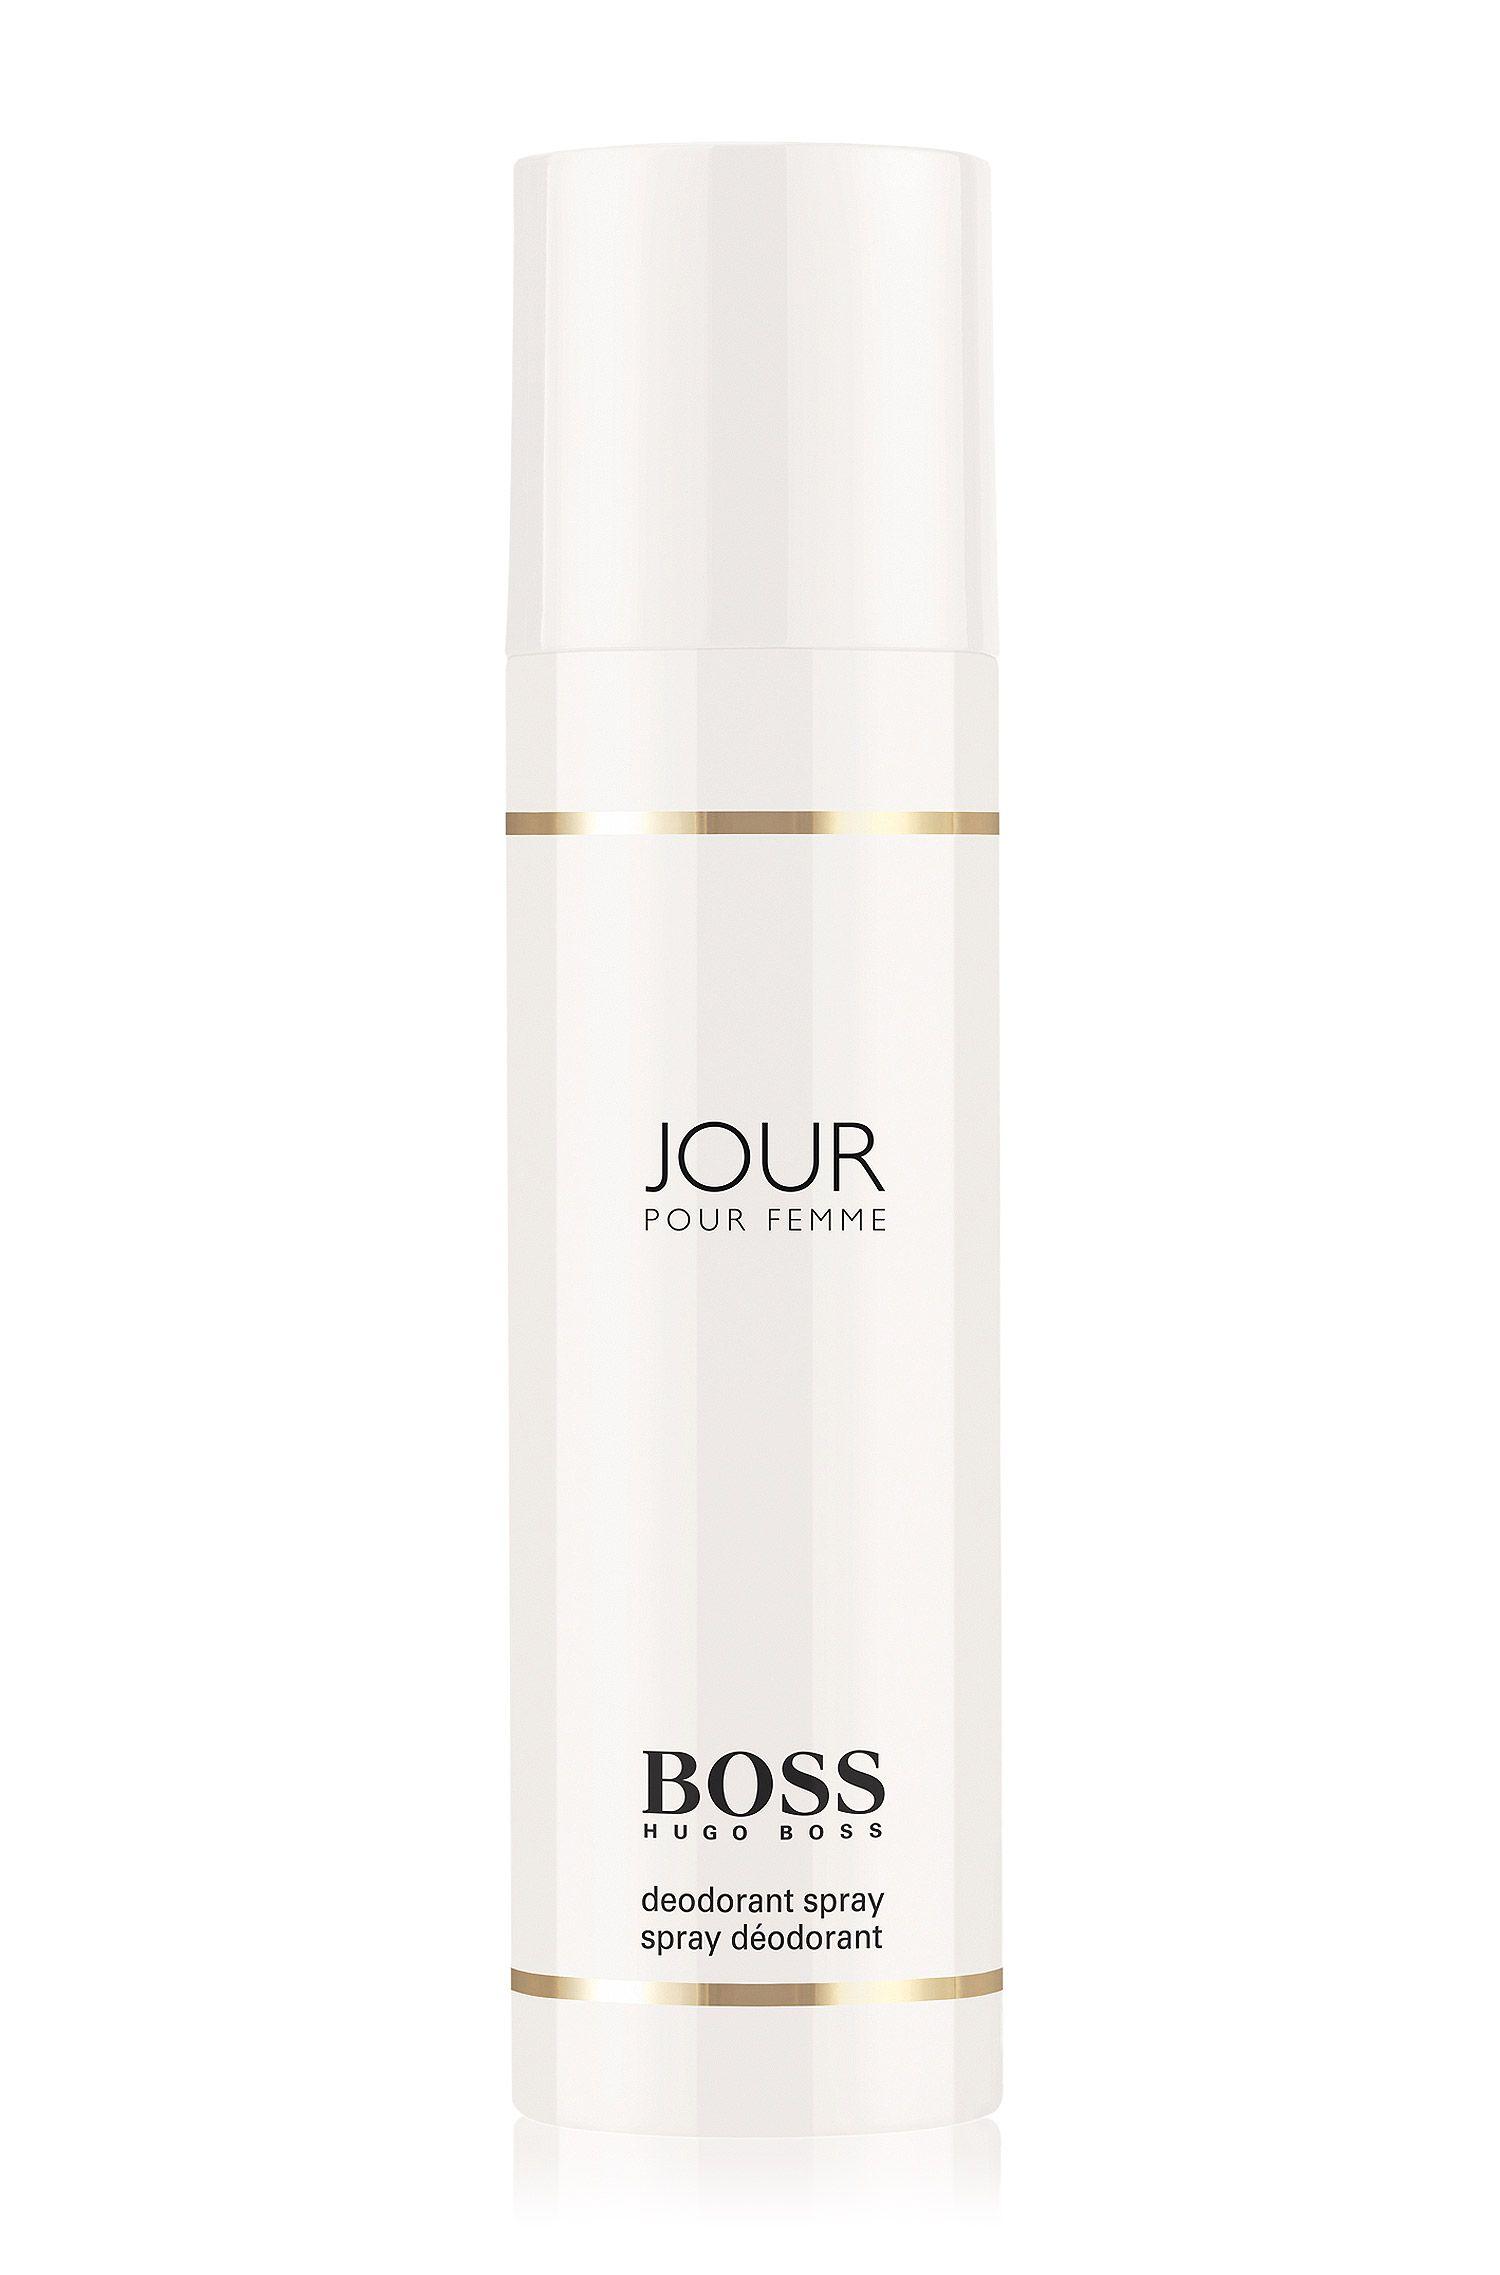 Déo spray BOSS Jour 150ml